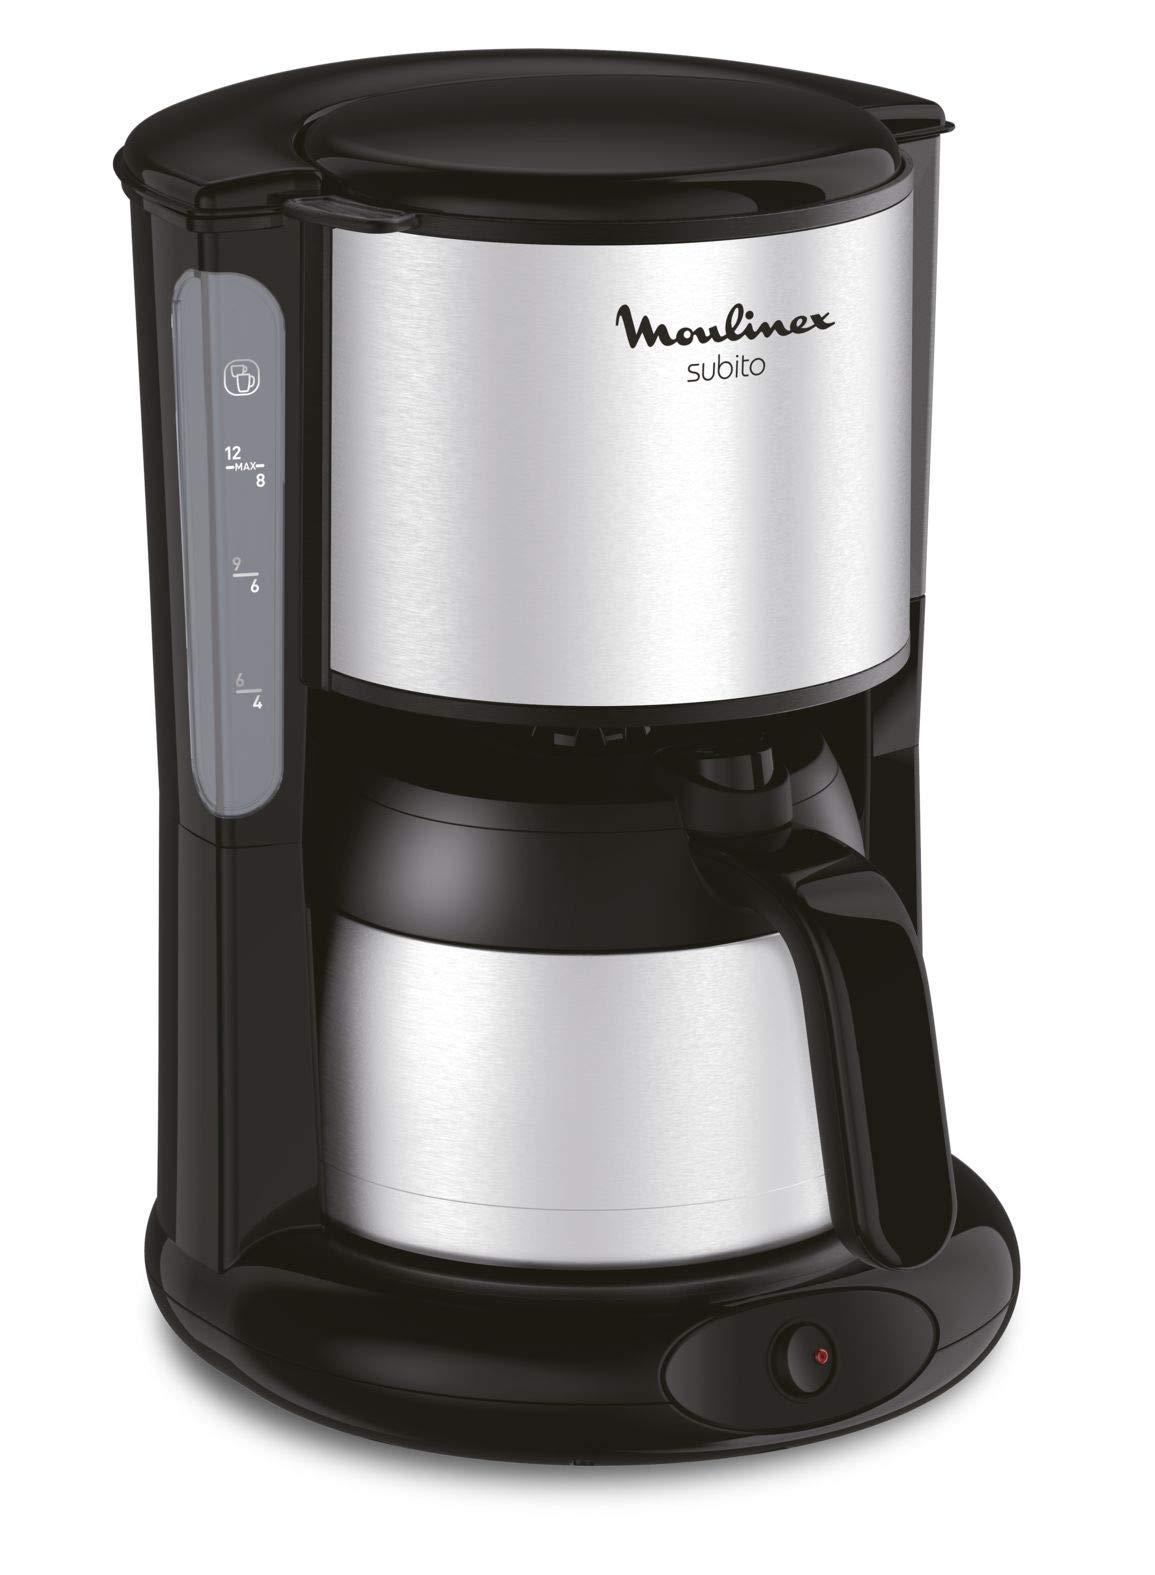 Moulinex-FT360811-Thermo-Kaffeemaschine-Subito-edelstahlSchwarz